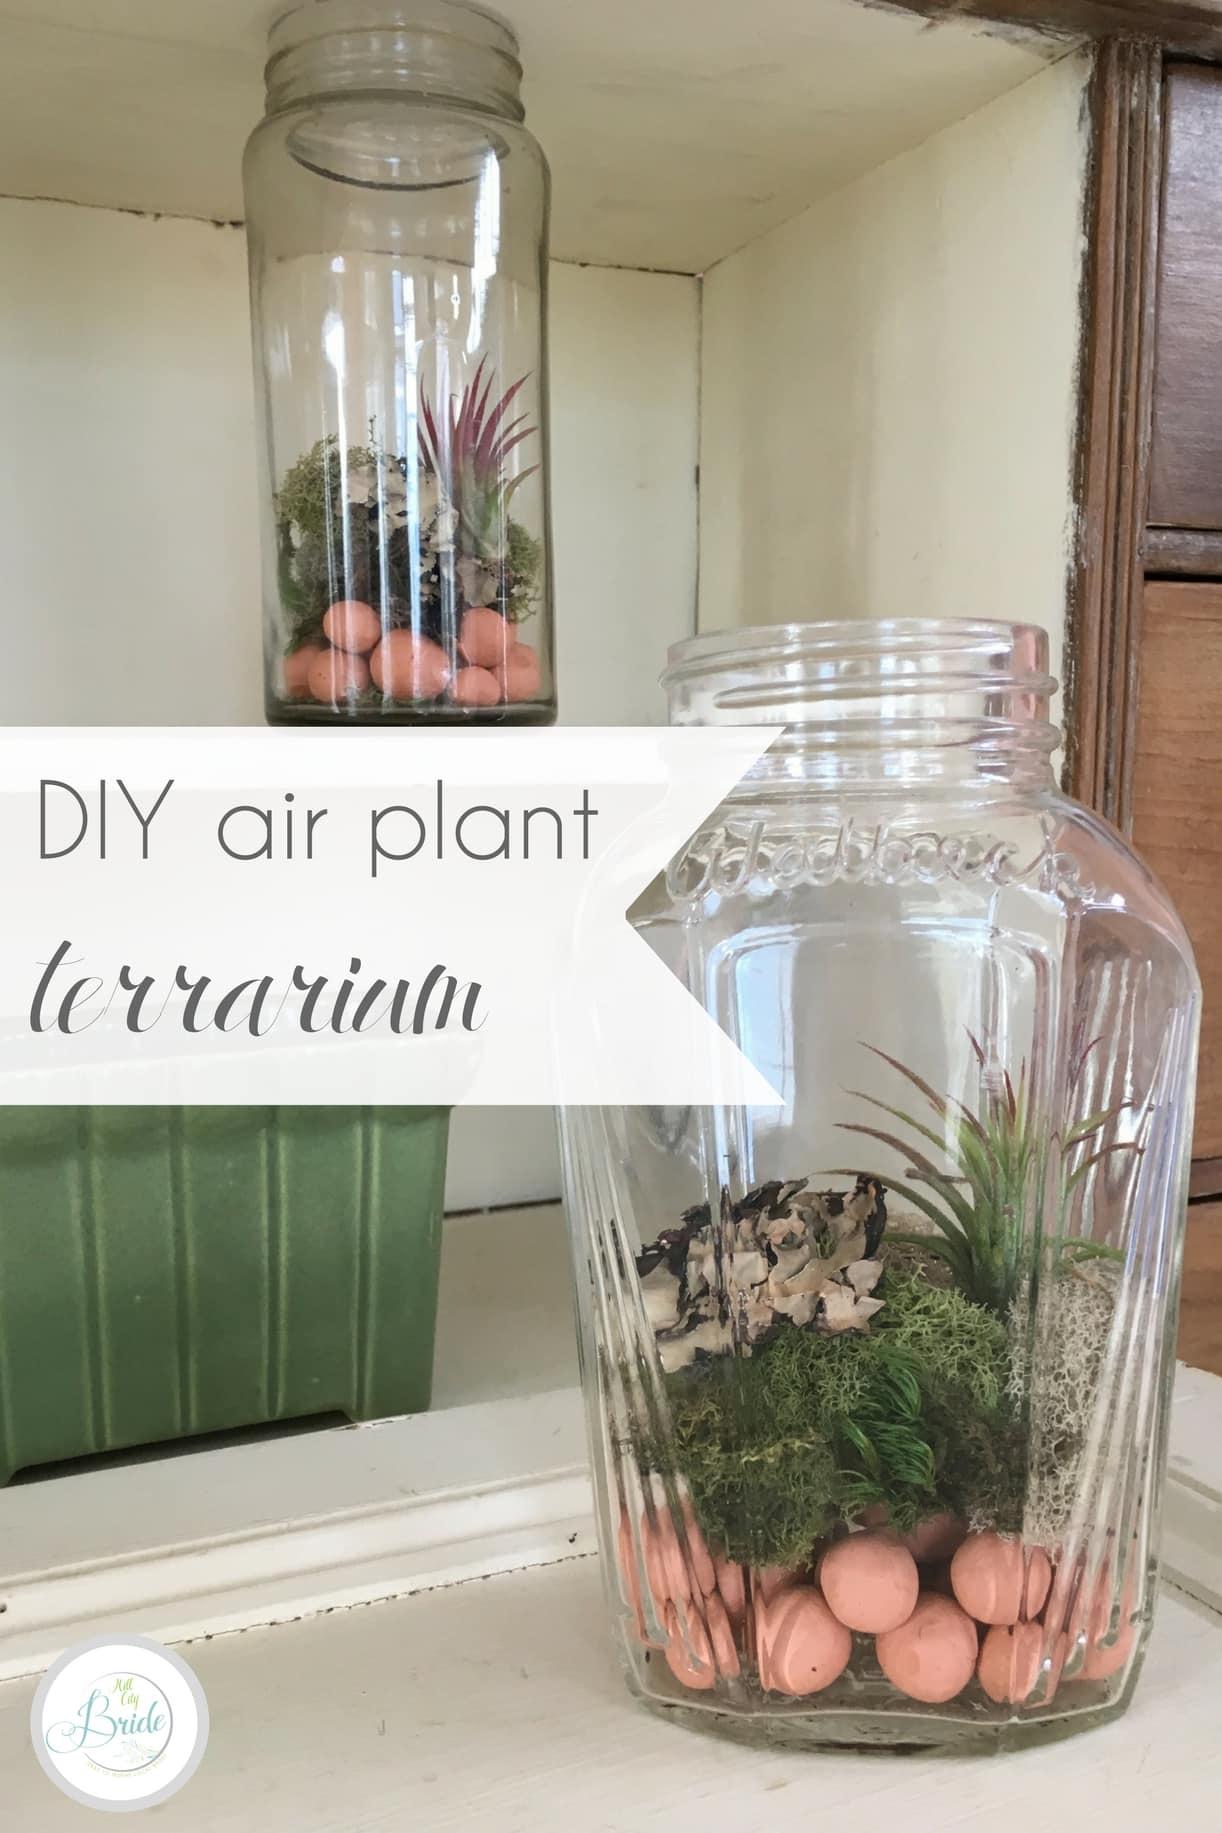 DIY Air Plant Terrarium| Hill City Bride Virginia Wedding Blog